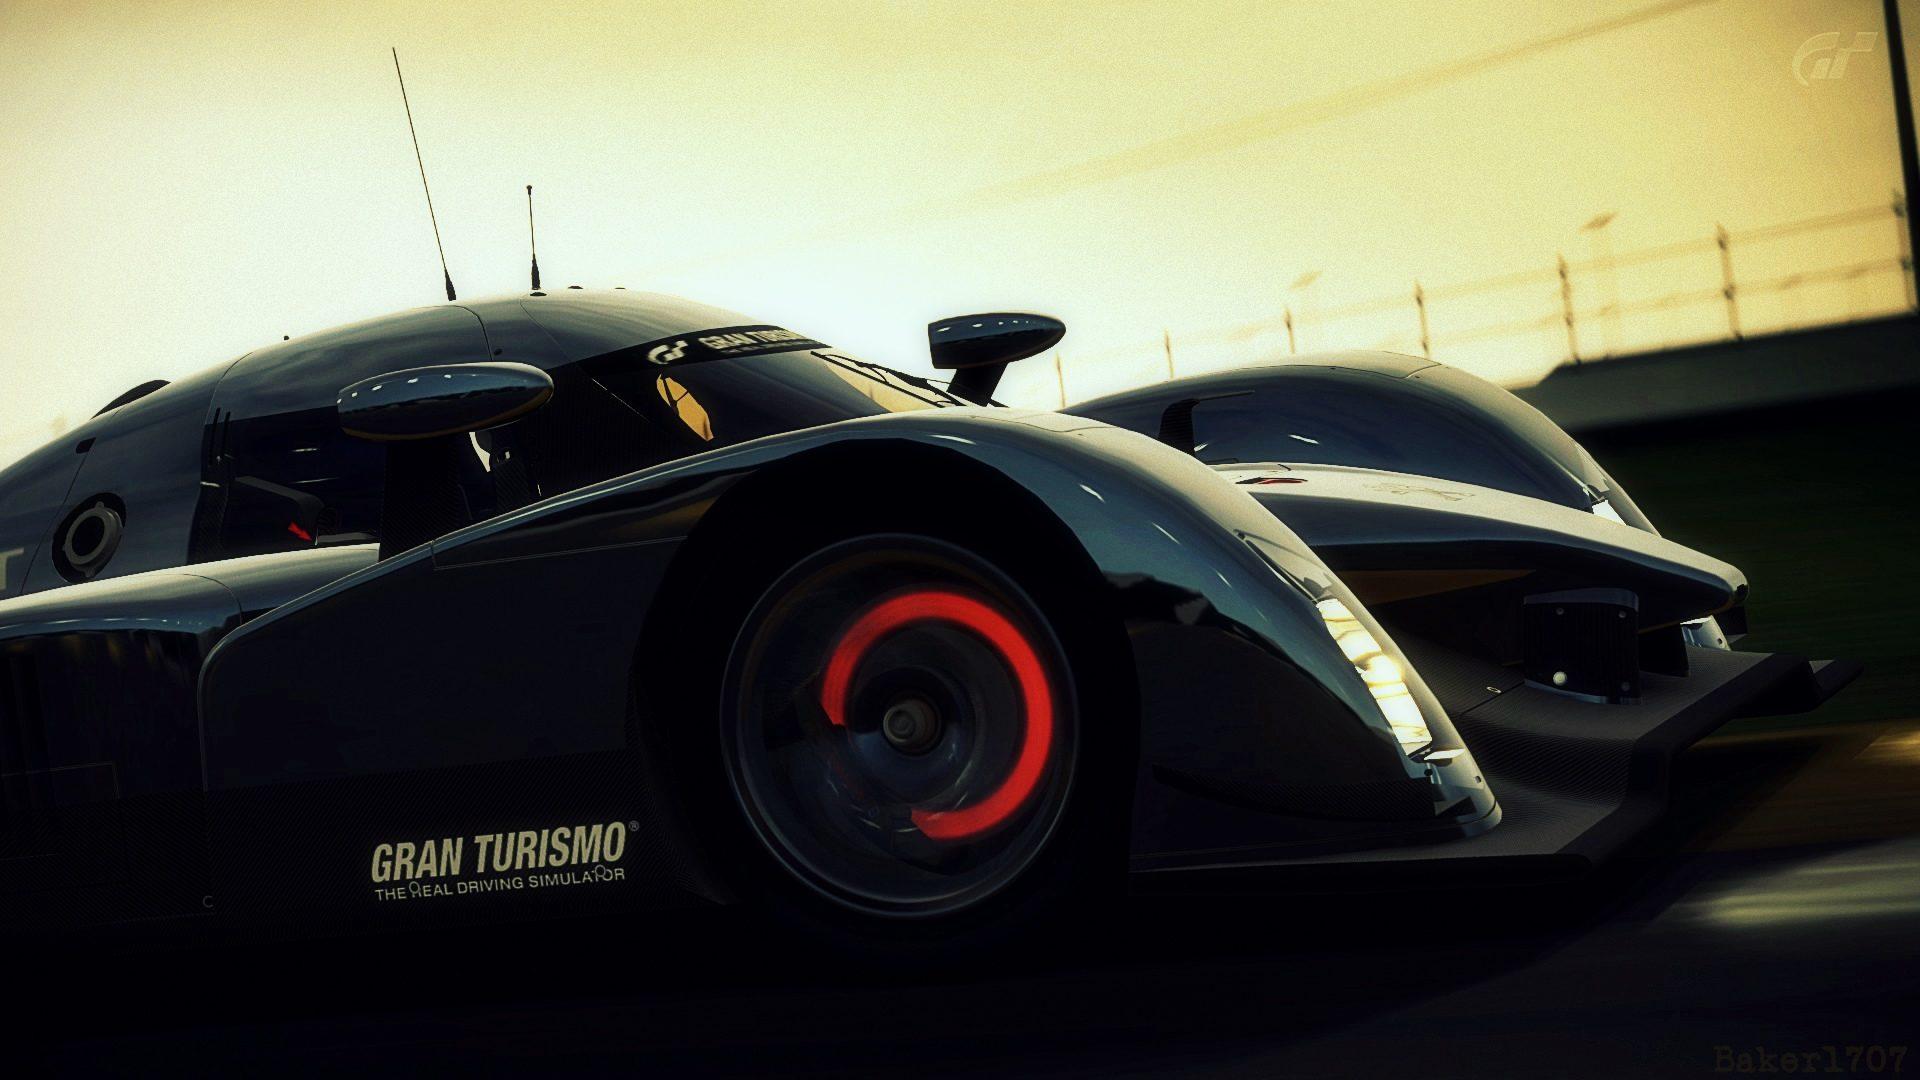 Daytona Road Course_56 edit.jpg